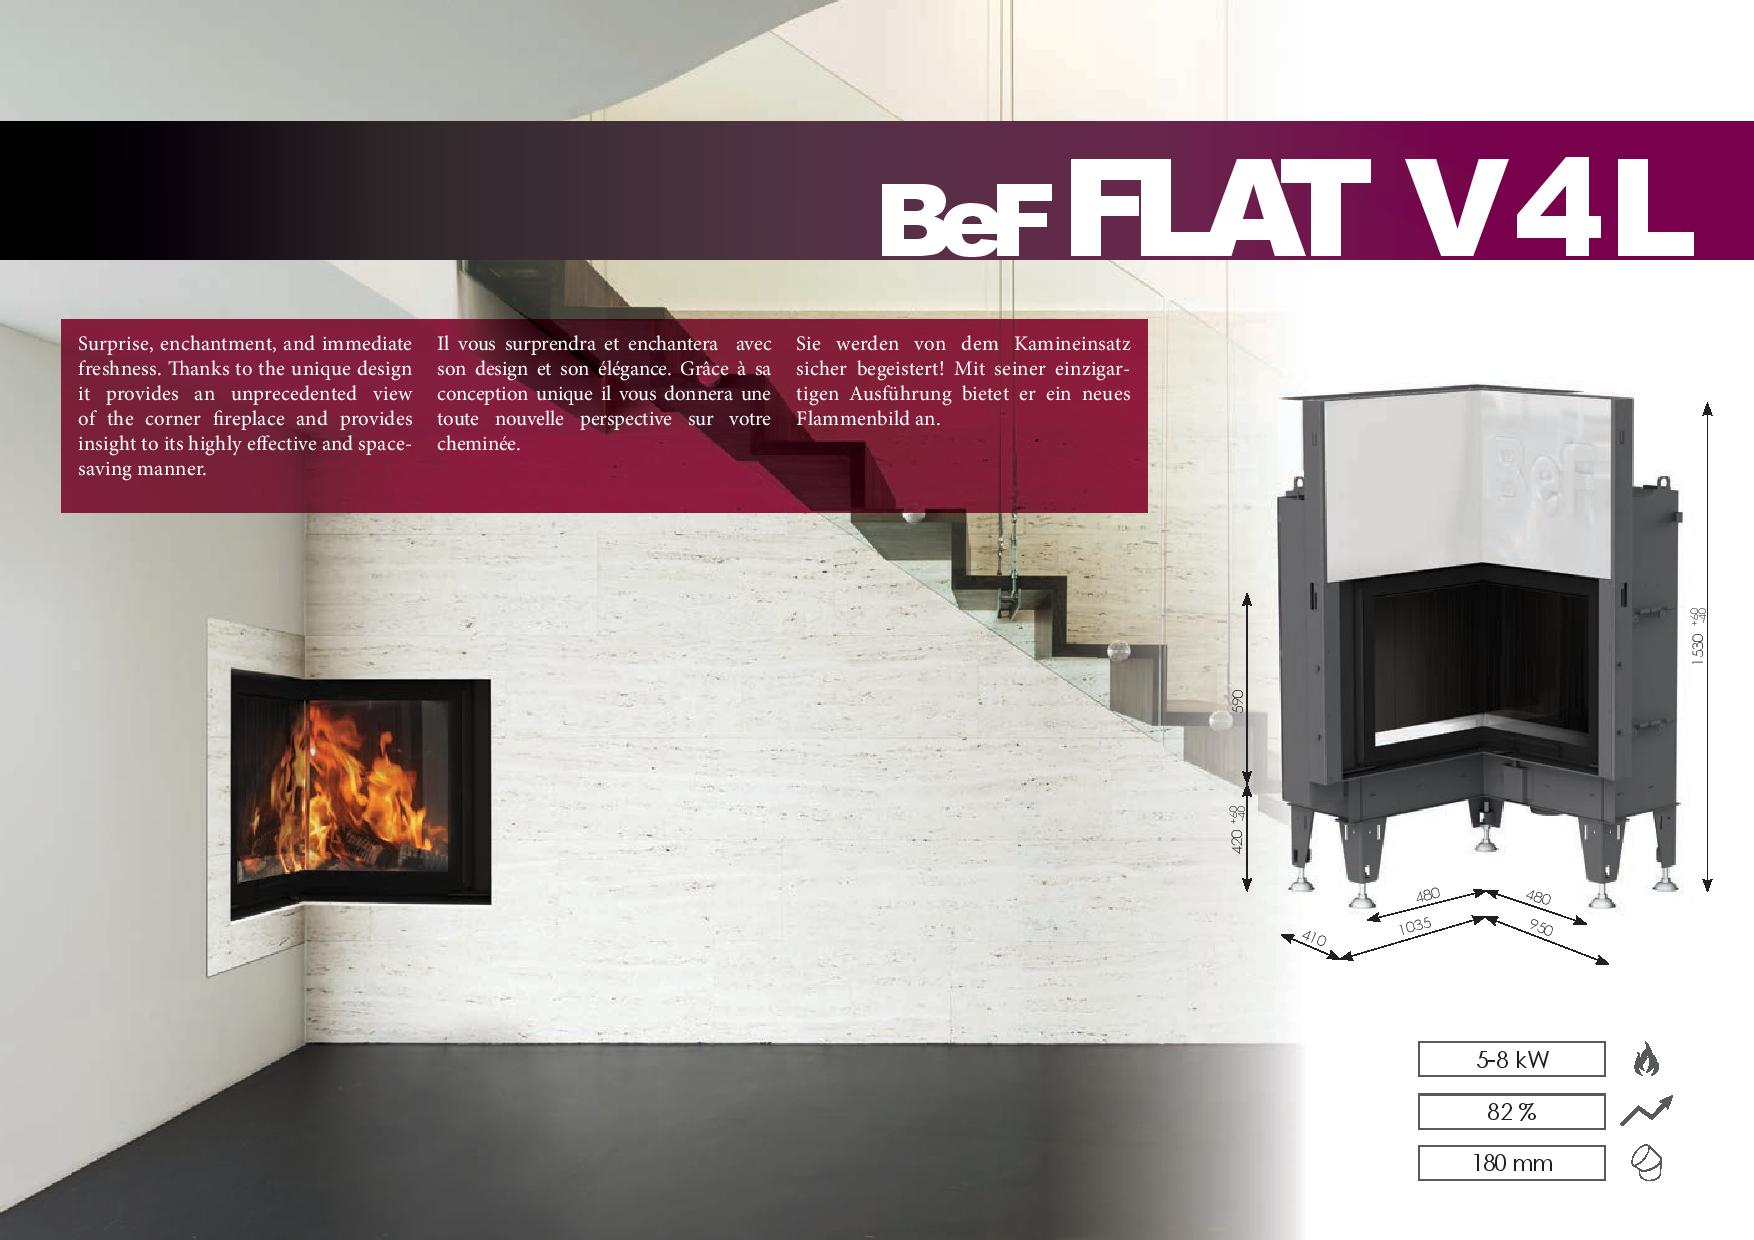 Foyers à bois FLAT BeF HOME 5/8 kw vitre d'angle rentrant relevable